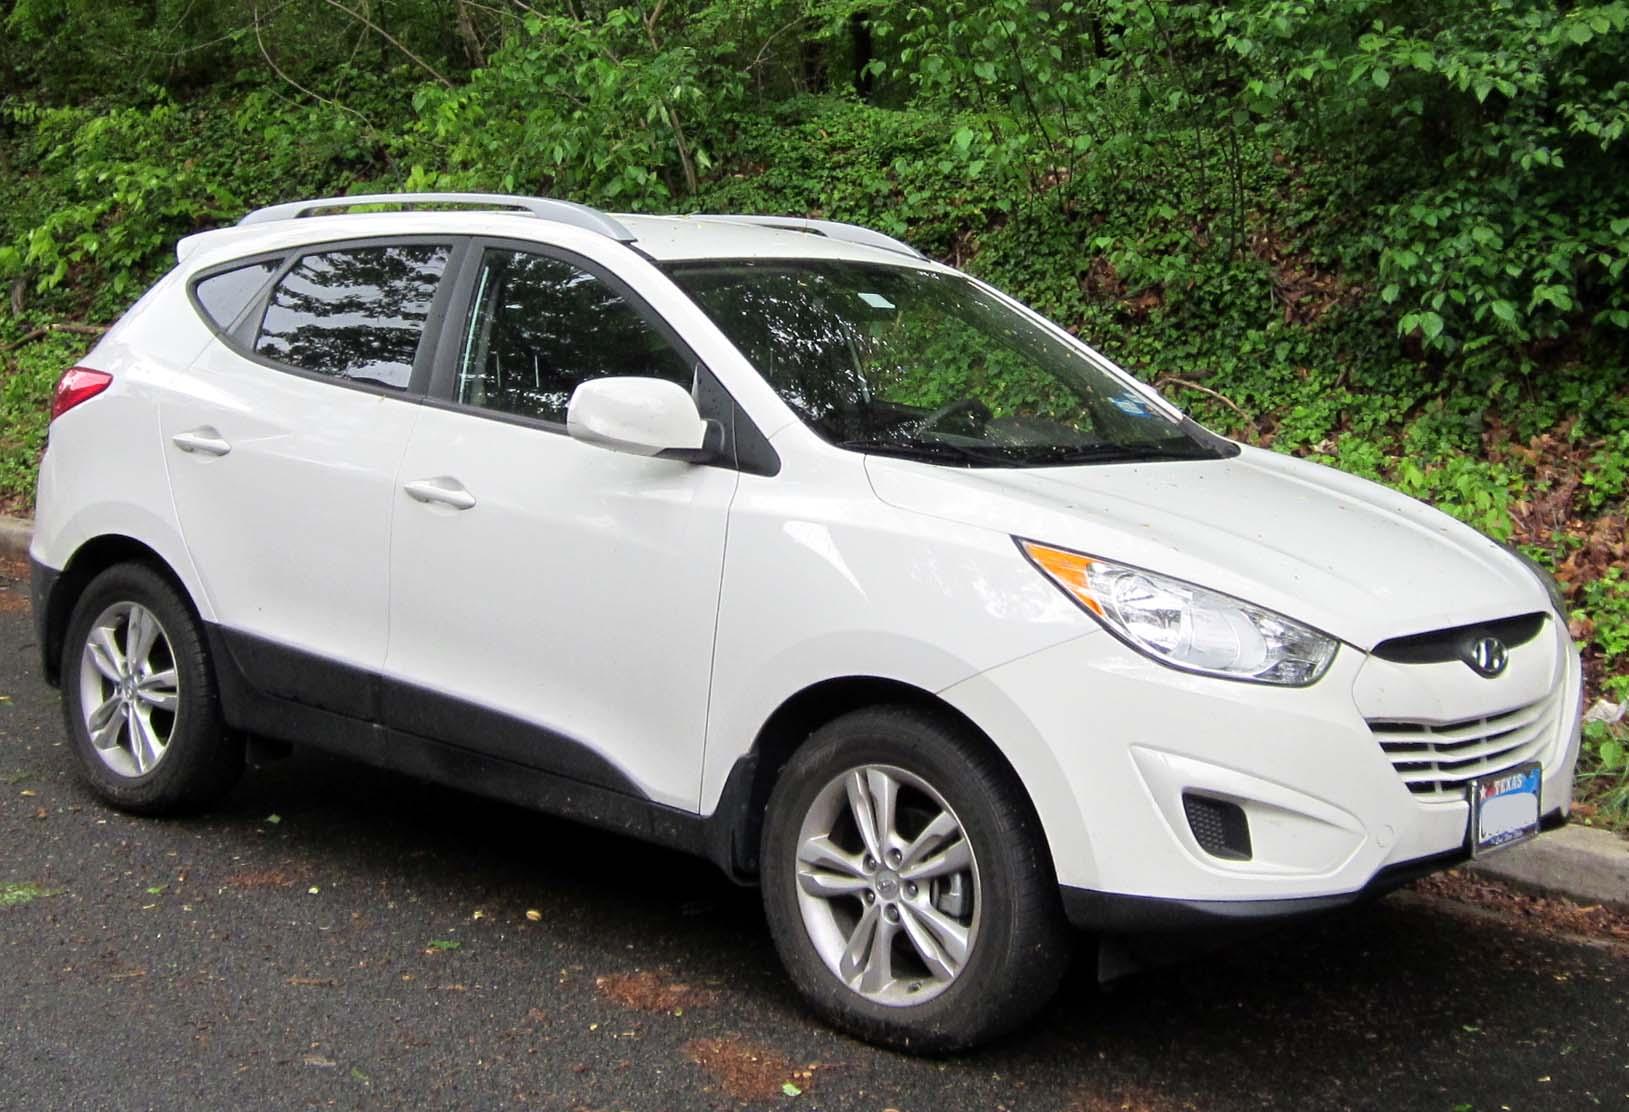 2012 Hyundai Tucson Image 13